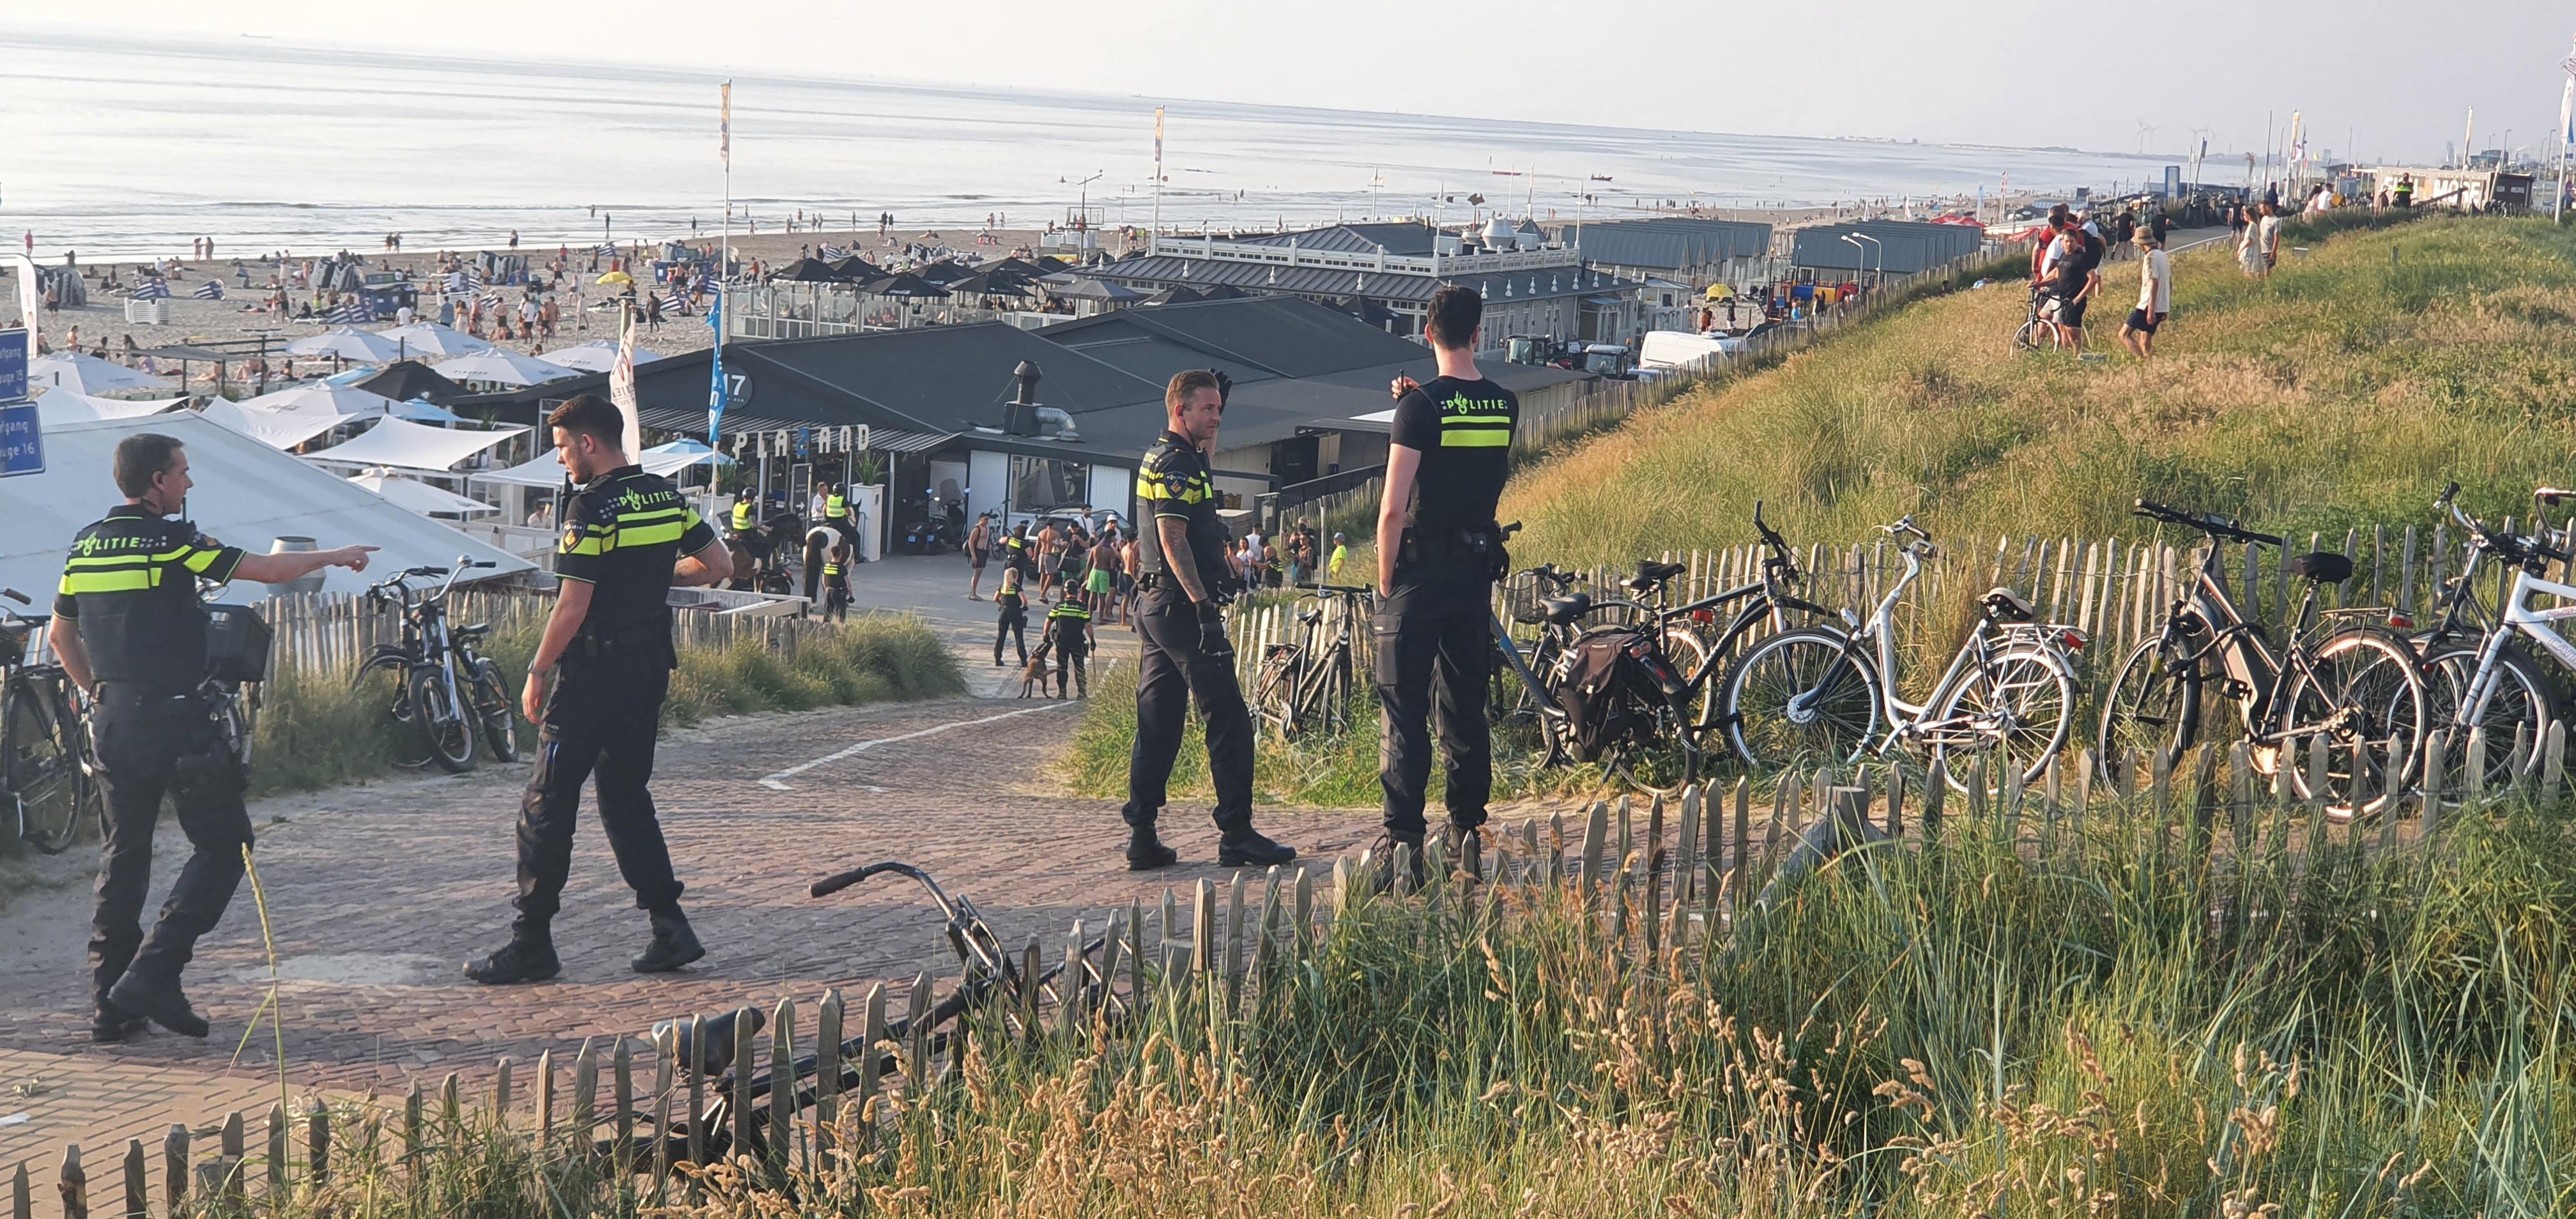 Grote groep 'uitermate vervelende' en vechtende jongeren van strand geveegd in Zandvoort